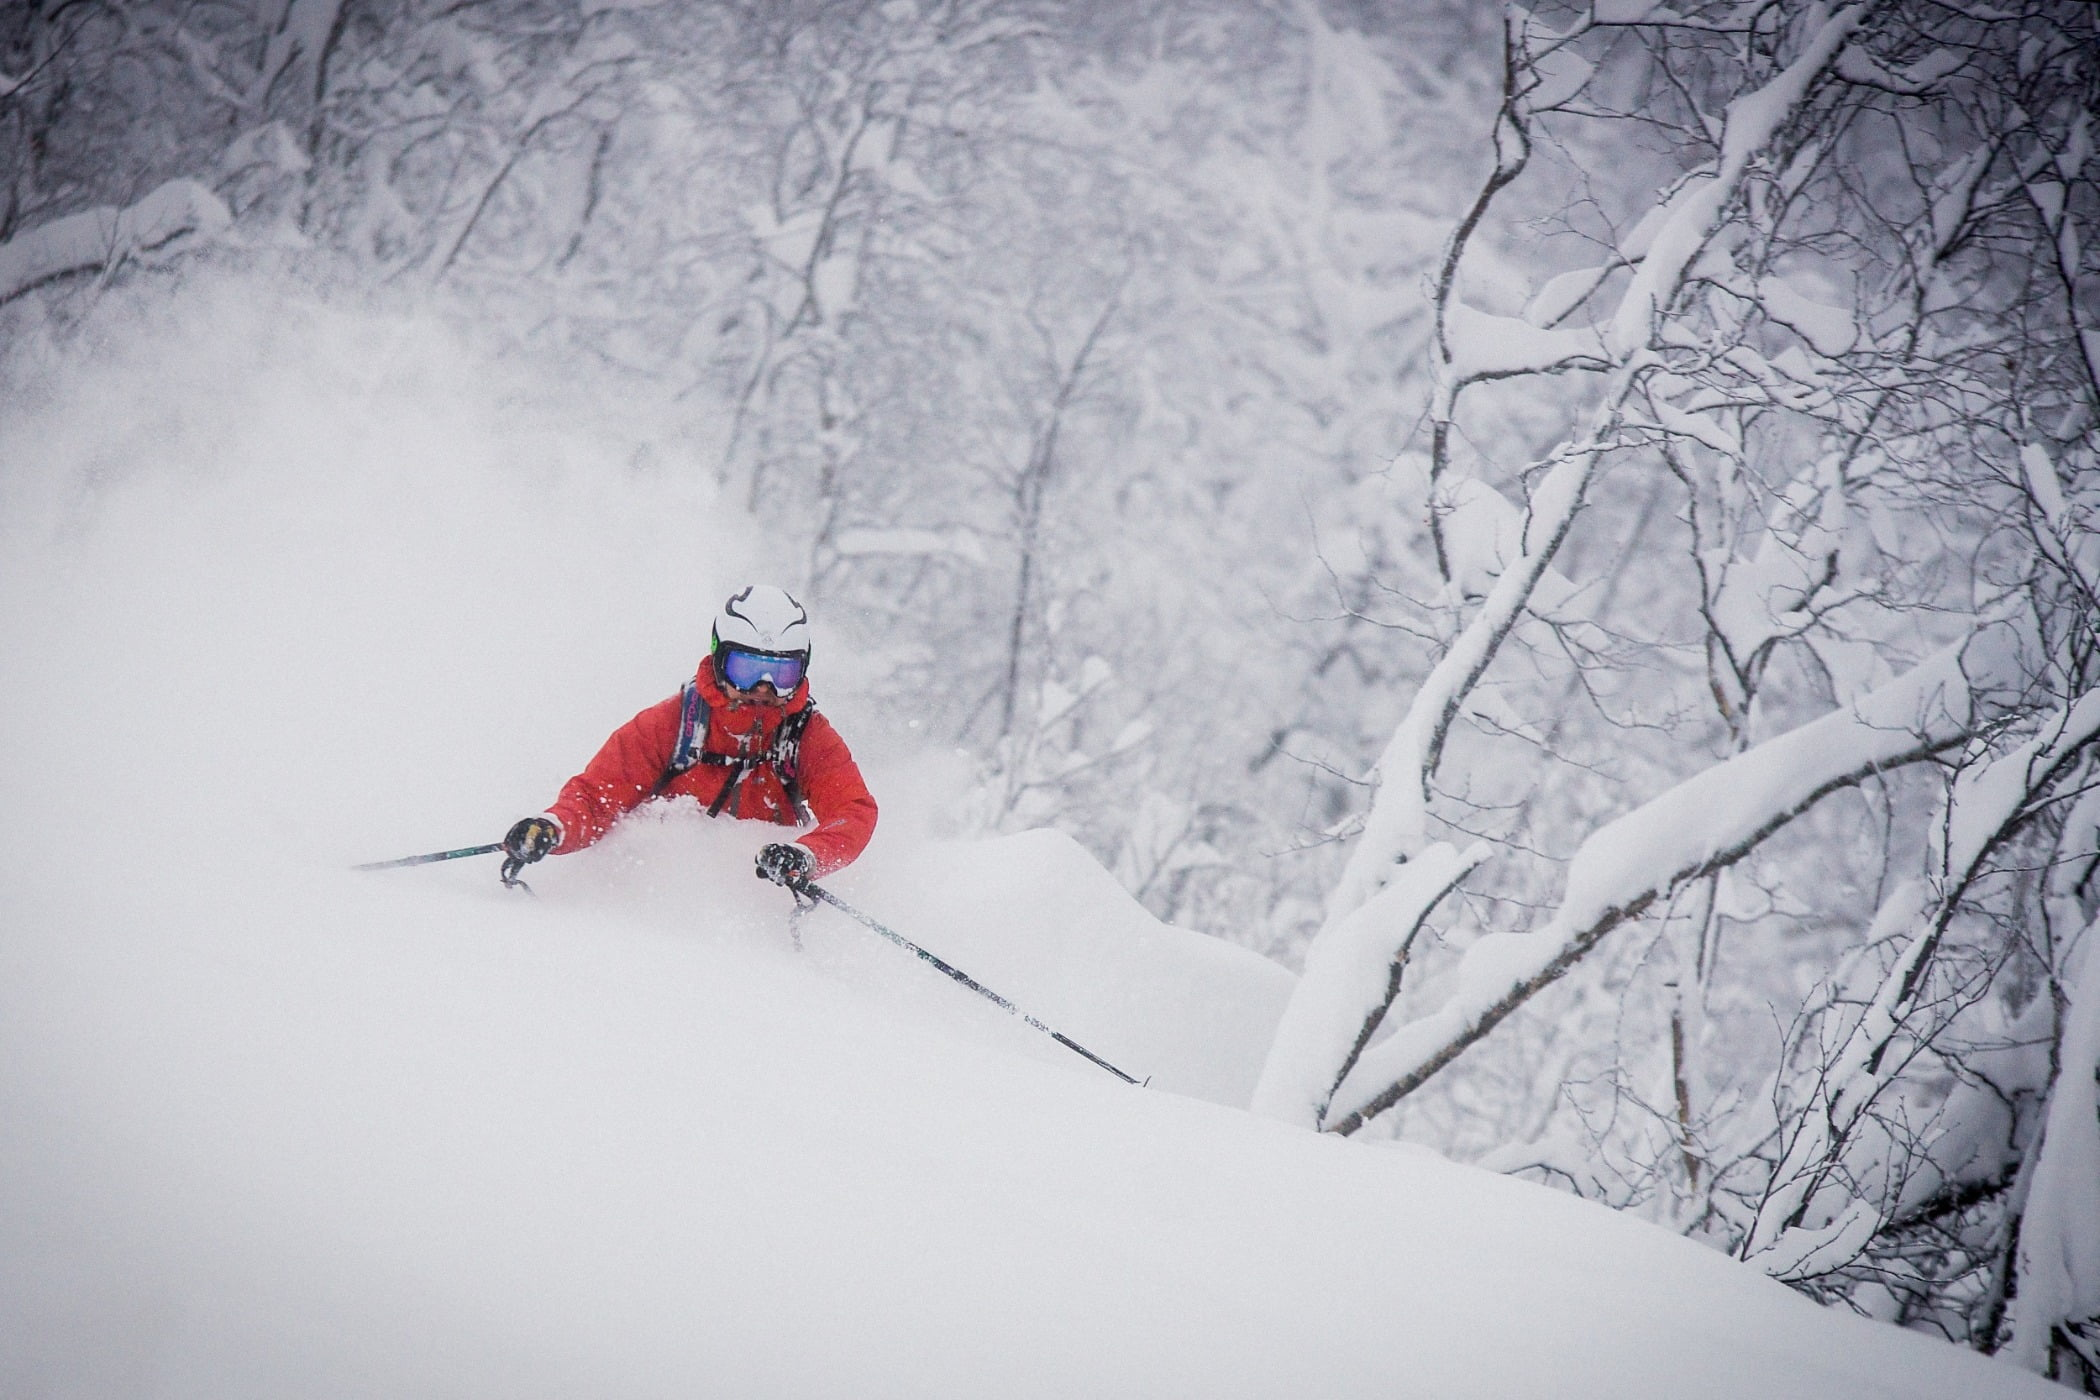 Ski Equipment, Geological phenomenon, Outdoor recreation, Winter sport, Carmine, Adventure, Snow, Freezing, Slope